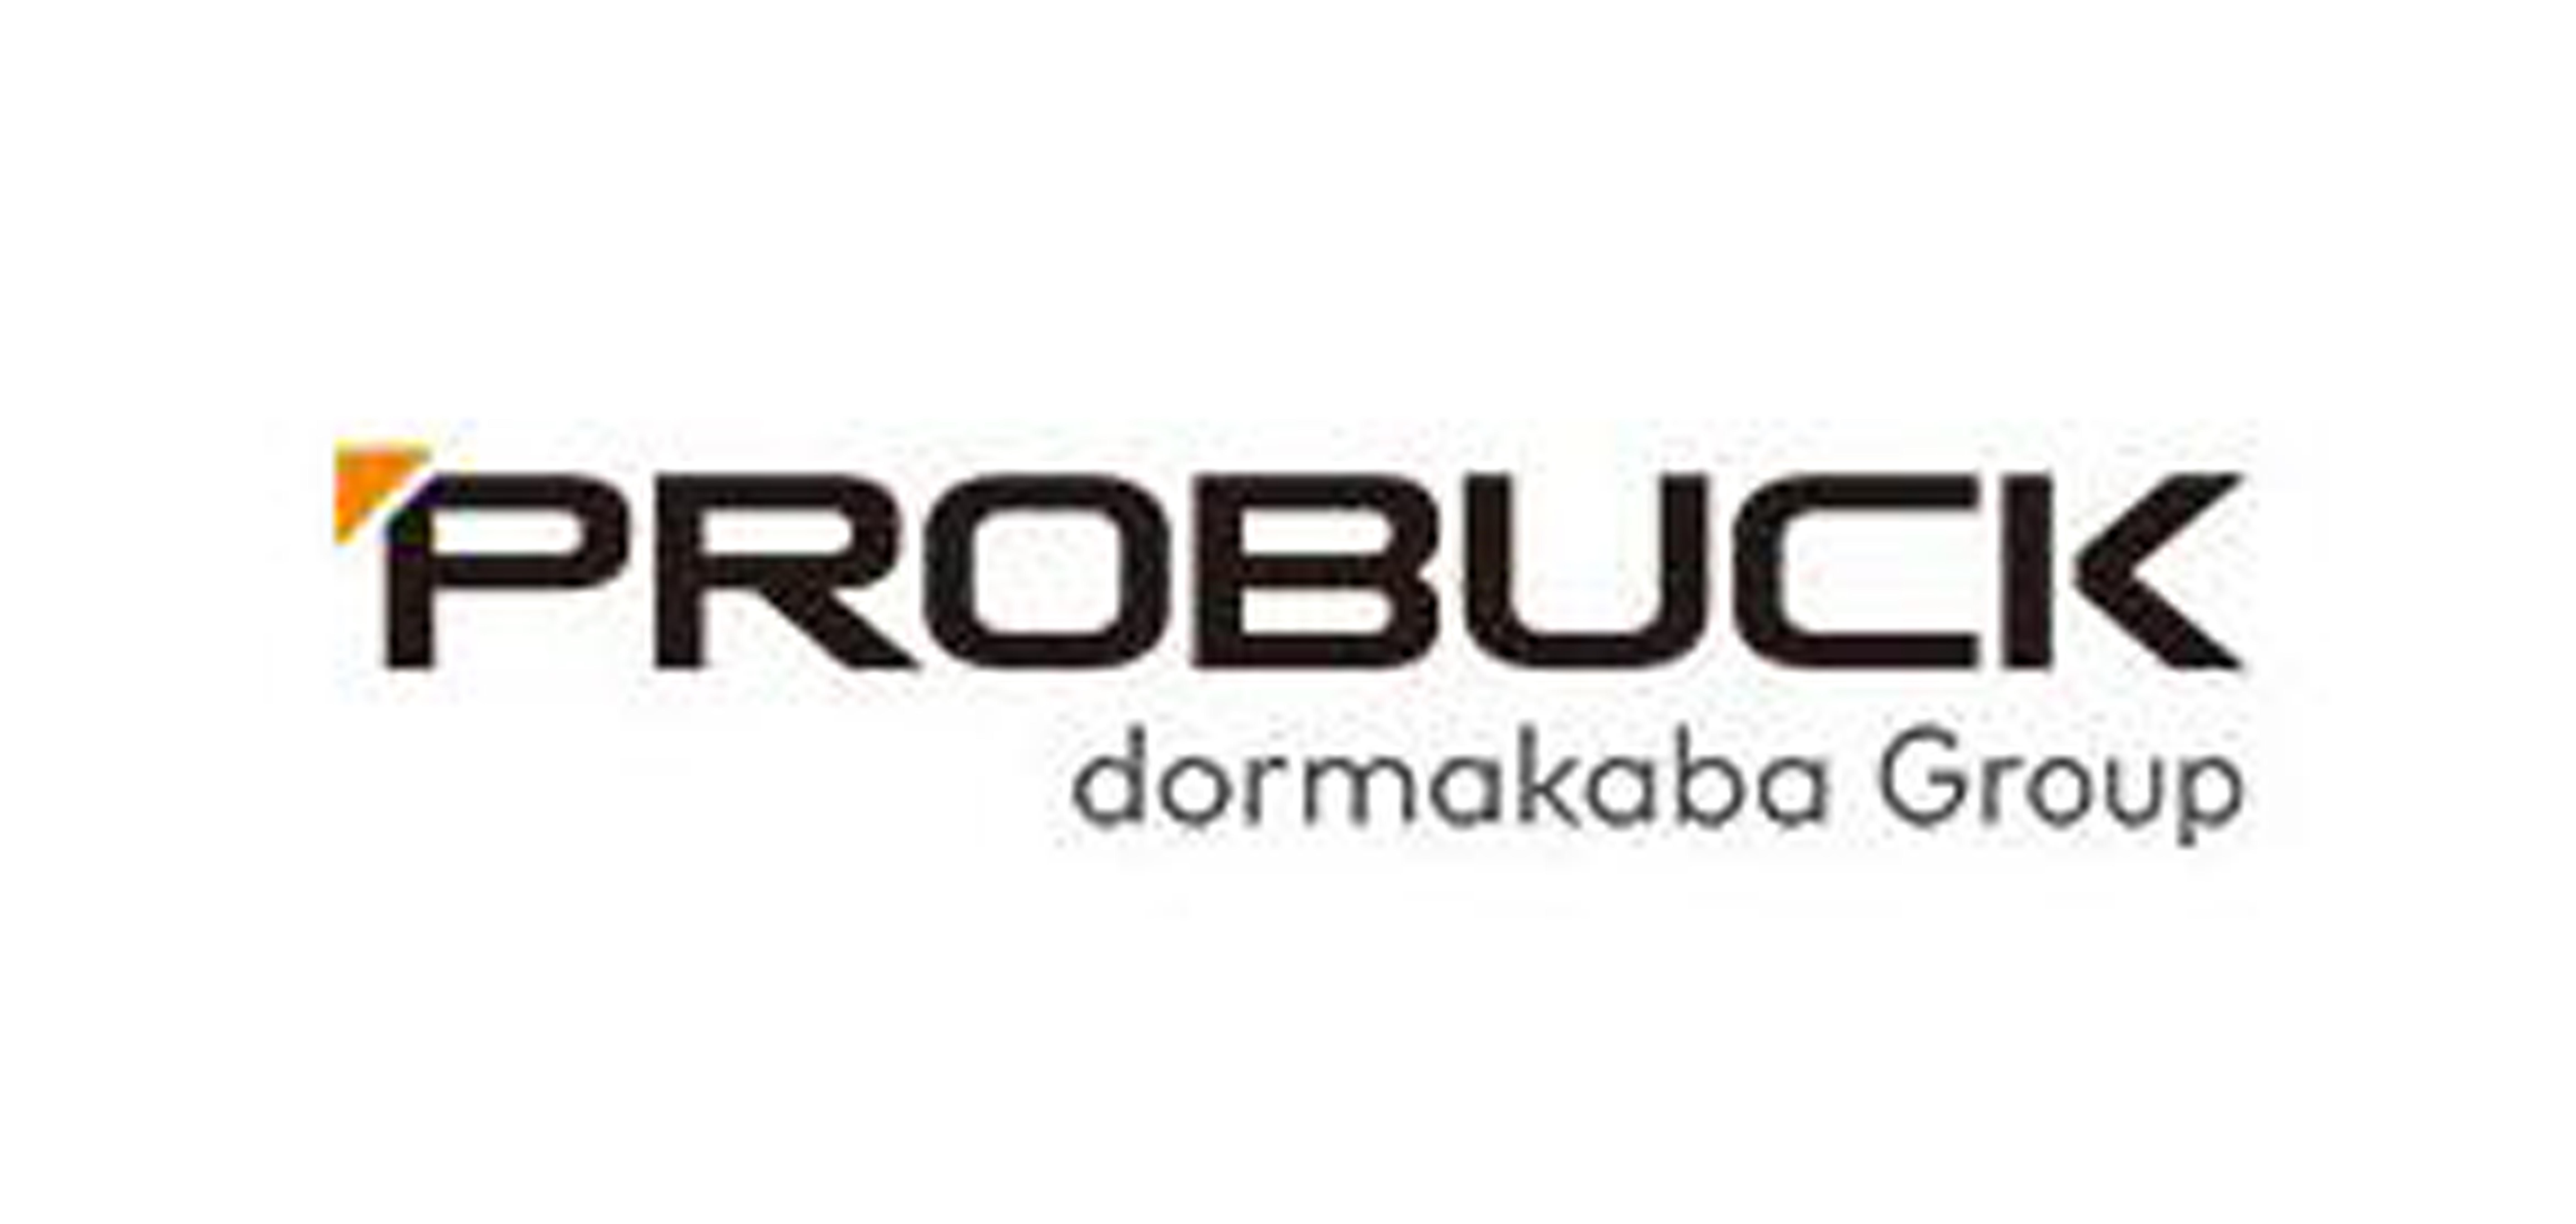 PROBUCK是什么牌子_普罗巴克品牌怎么样?